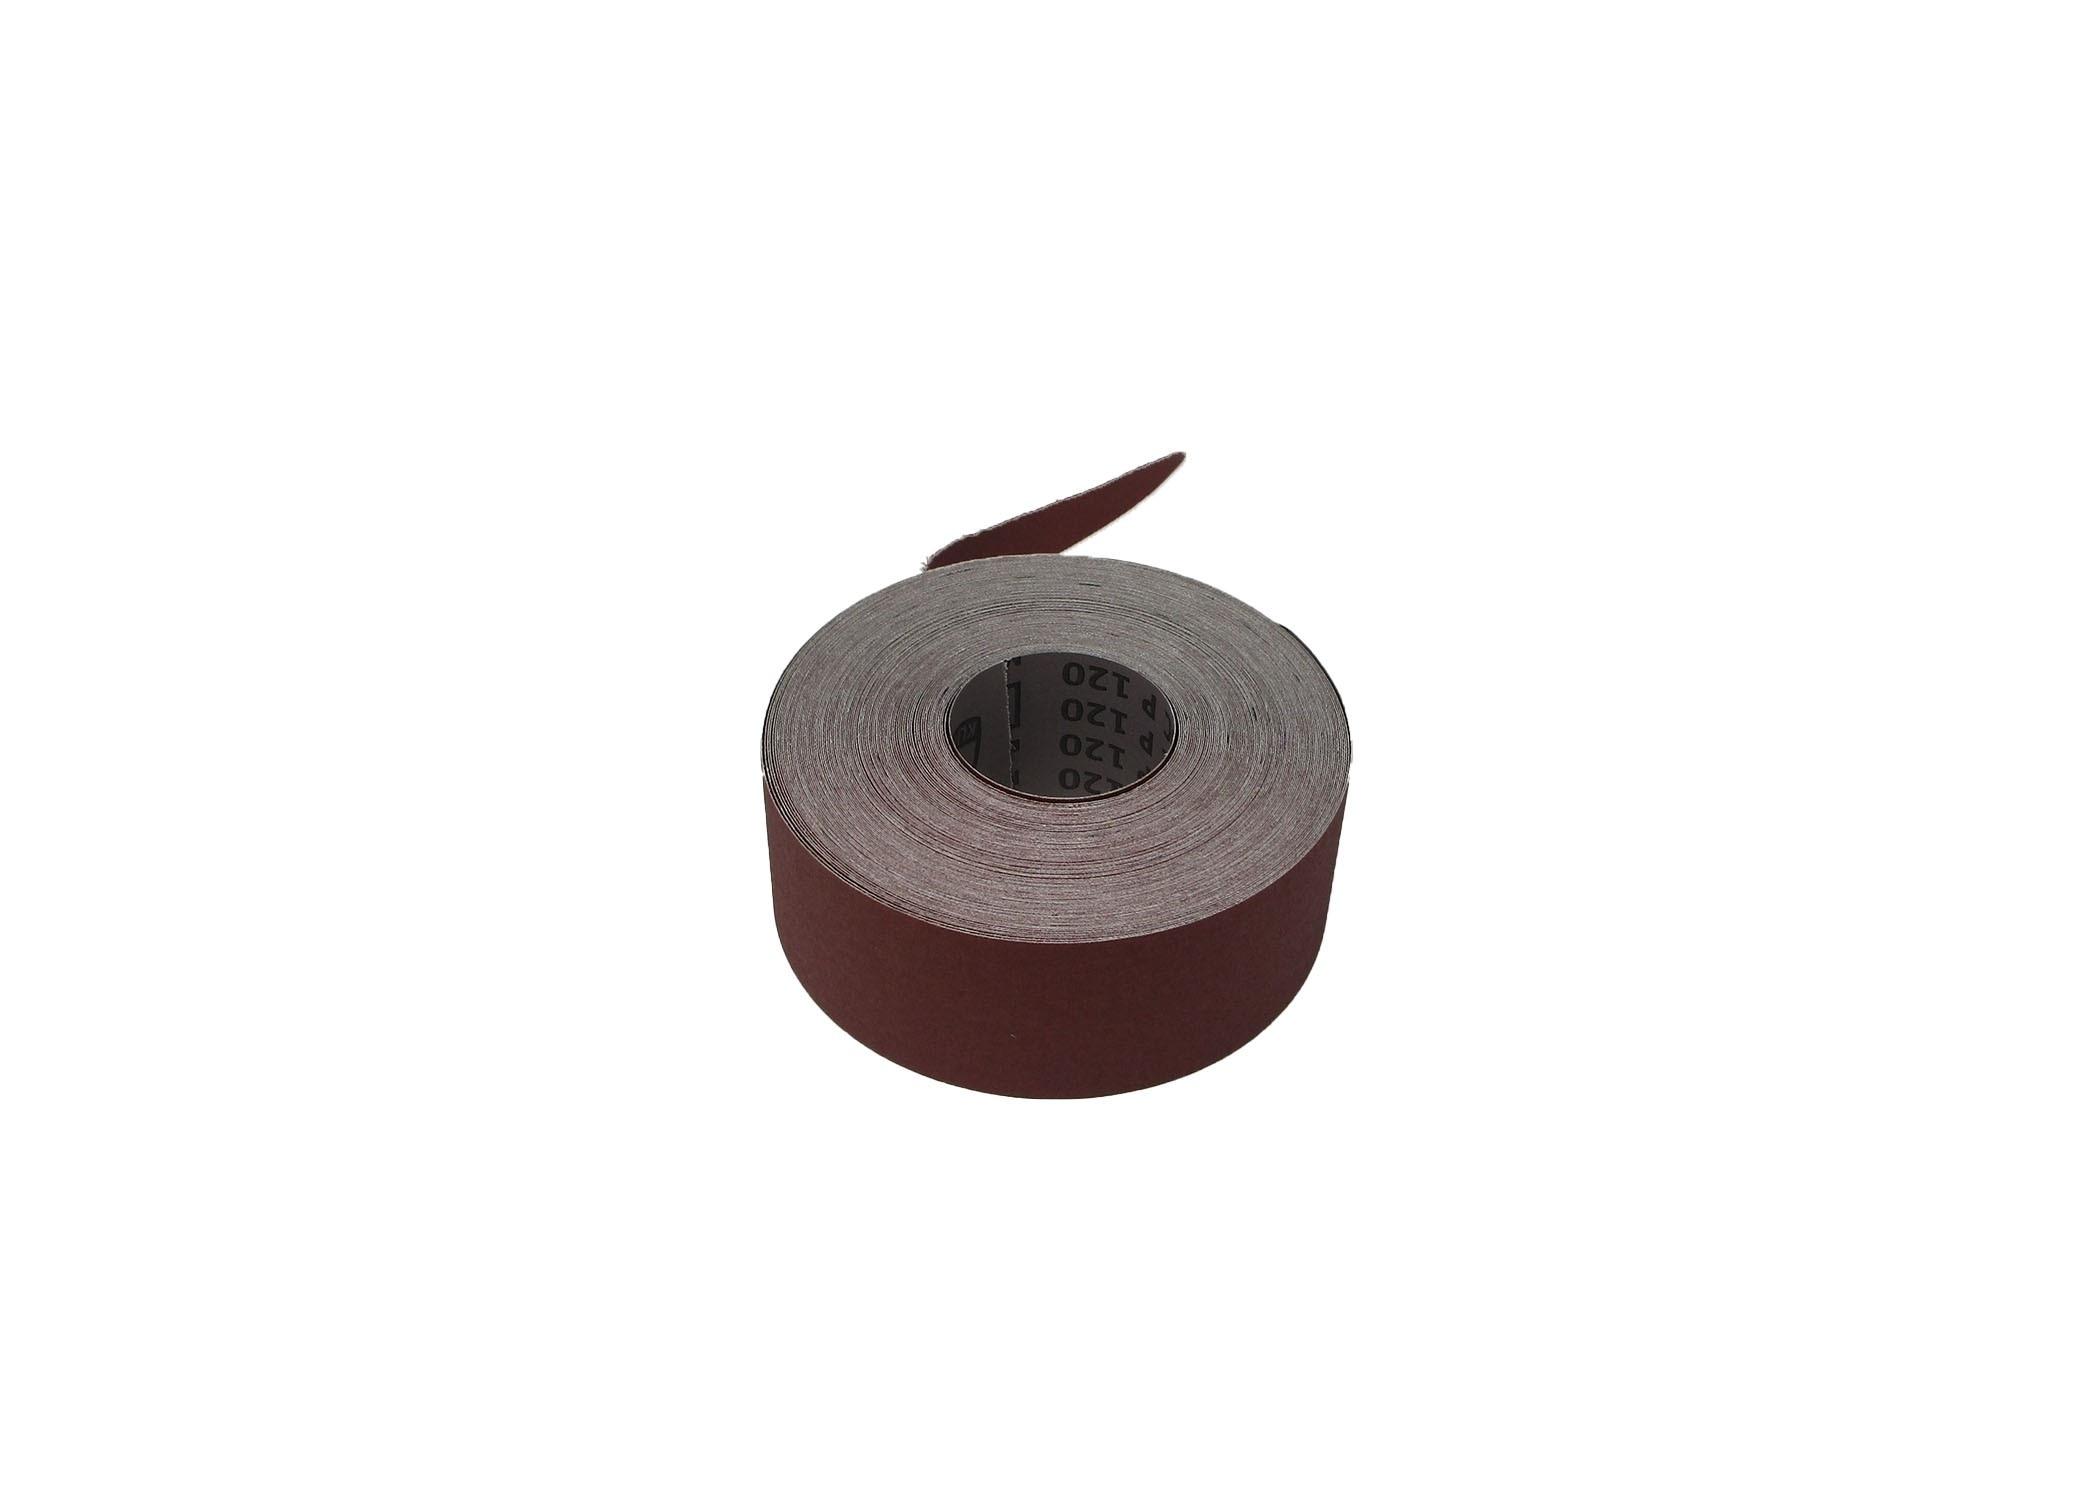 Premium Ready-To-Cut Abrasive, 120 Grit Sand Paper